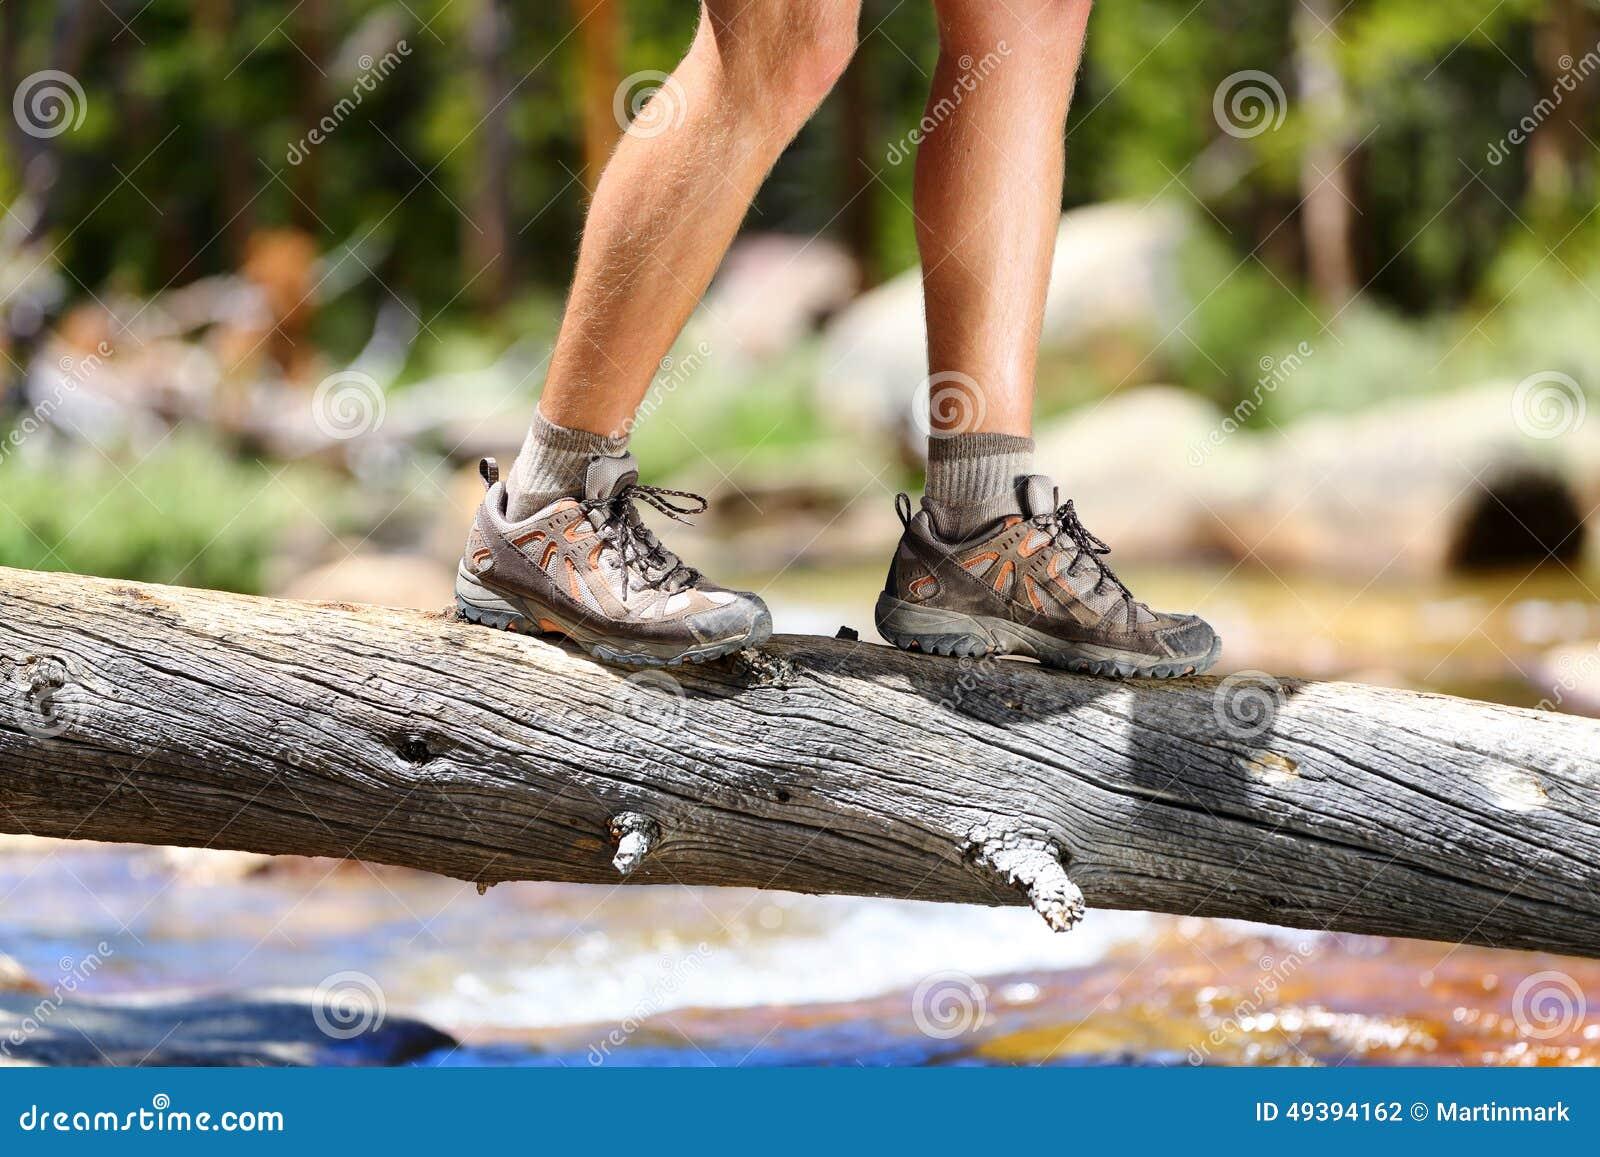 Hiking Shoes Man Hiker Balancing Crossing River Stock